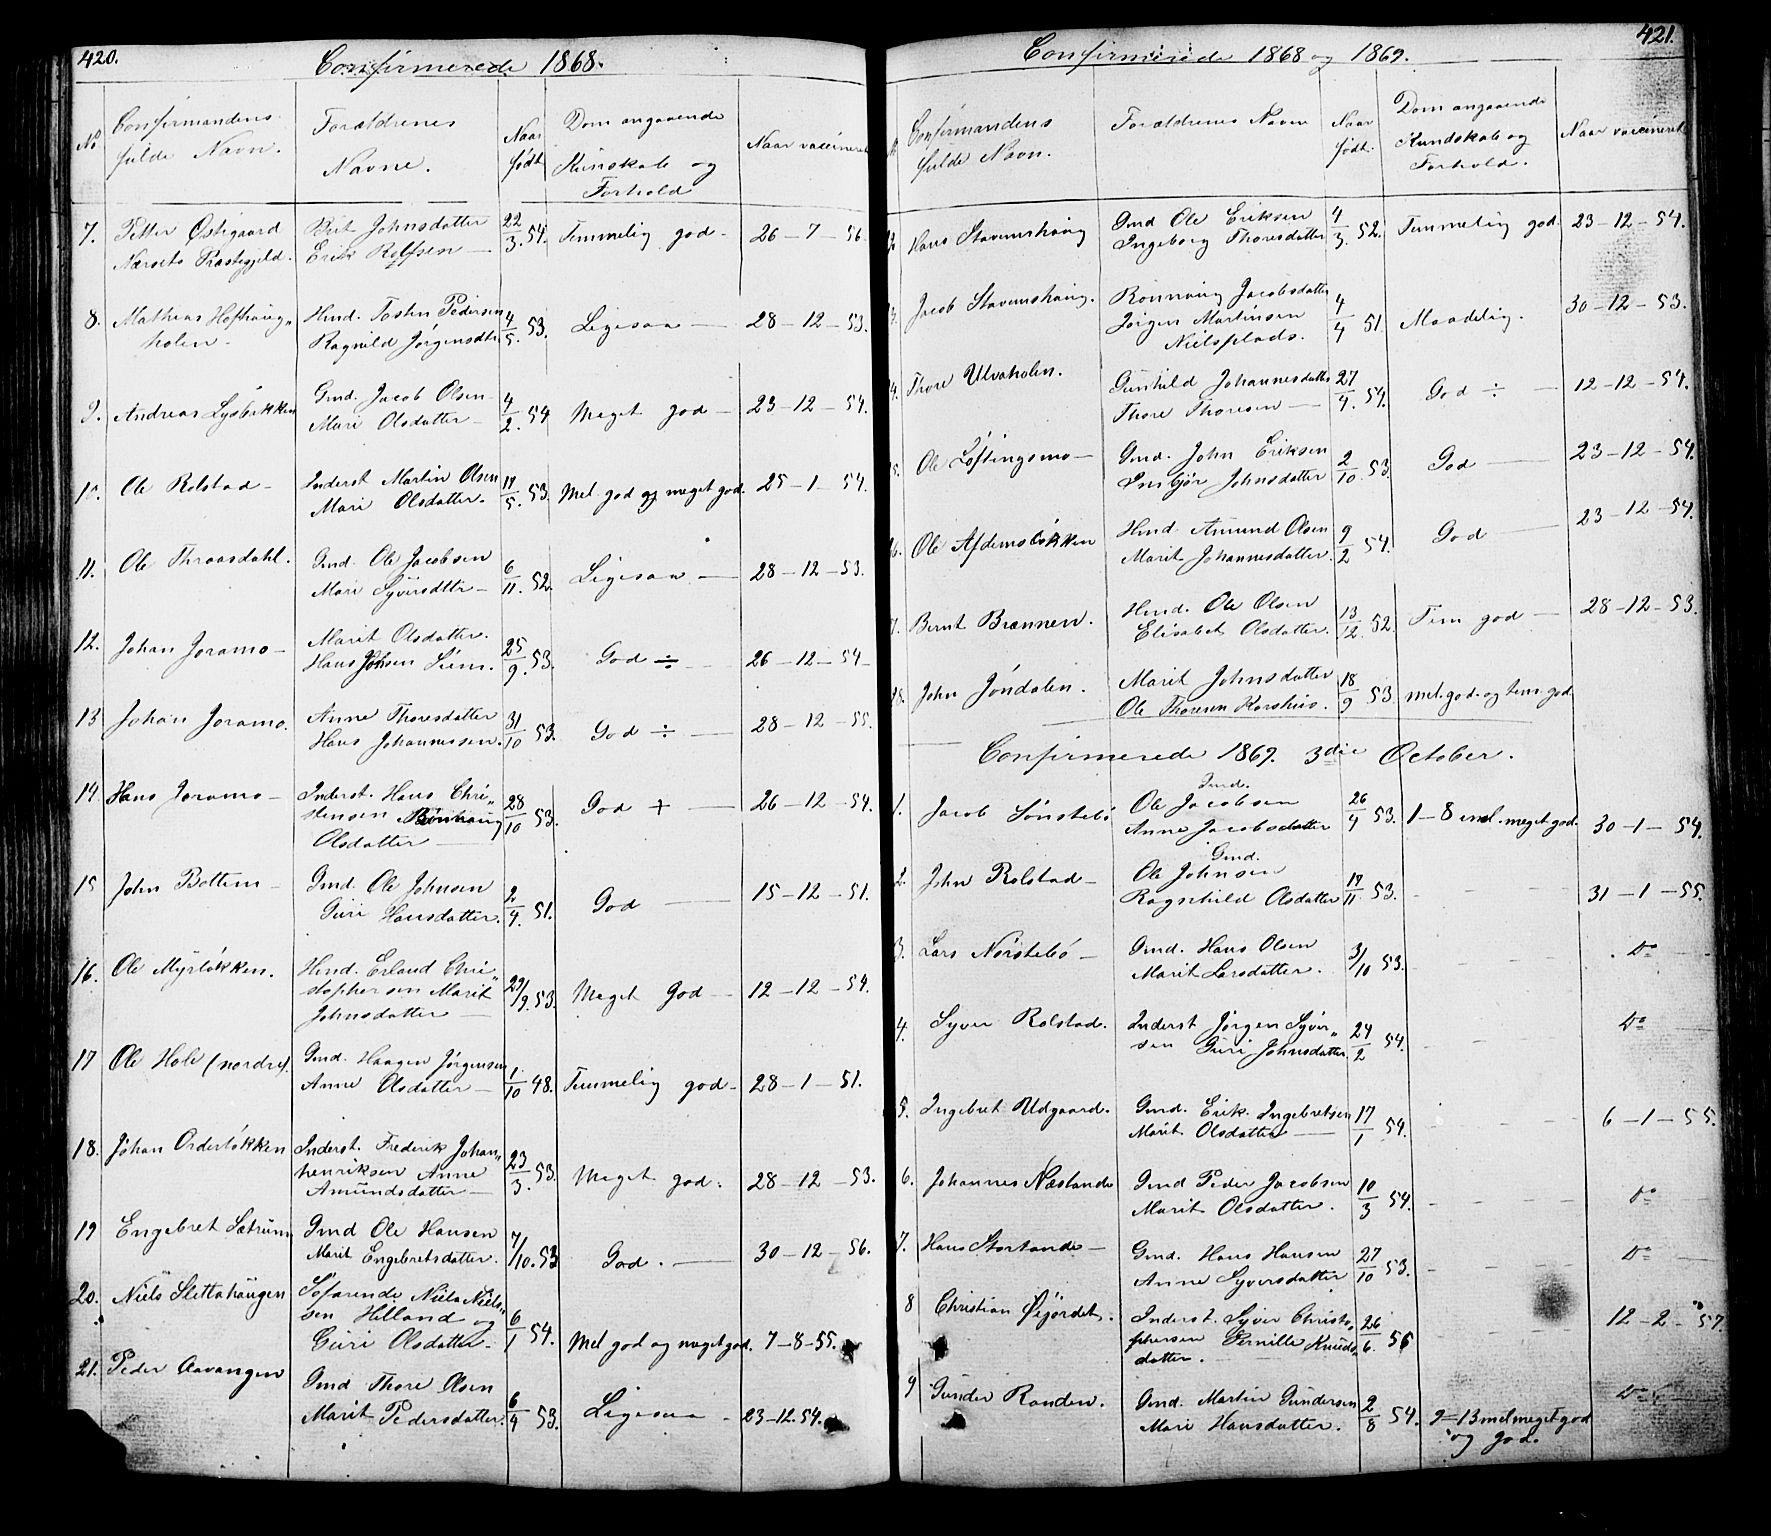 SAH, Lesja prestekontor, Klokkerbok nr. 5, 1850-1894, s. 420-421